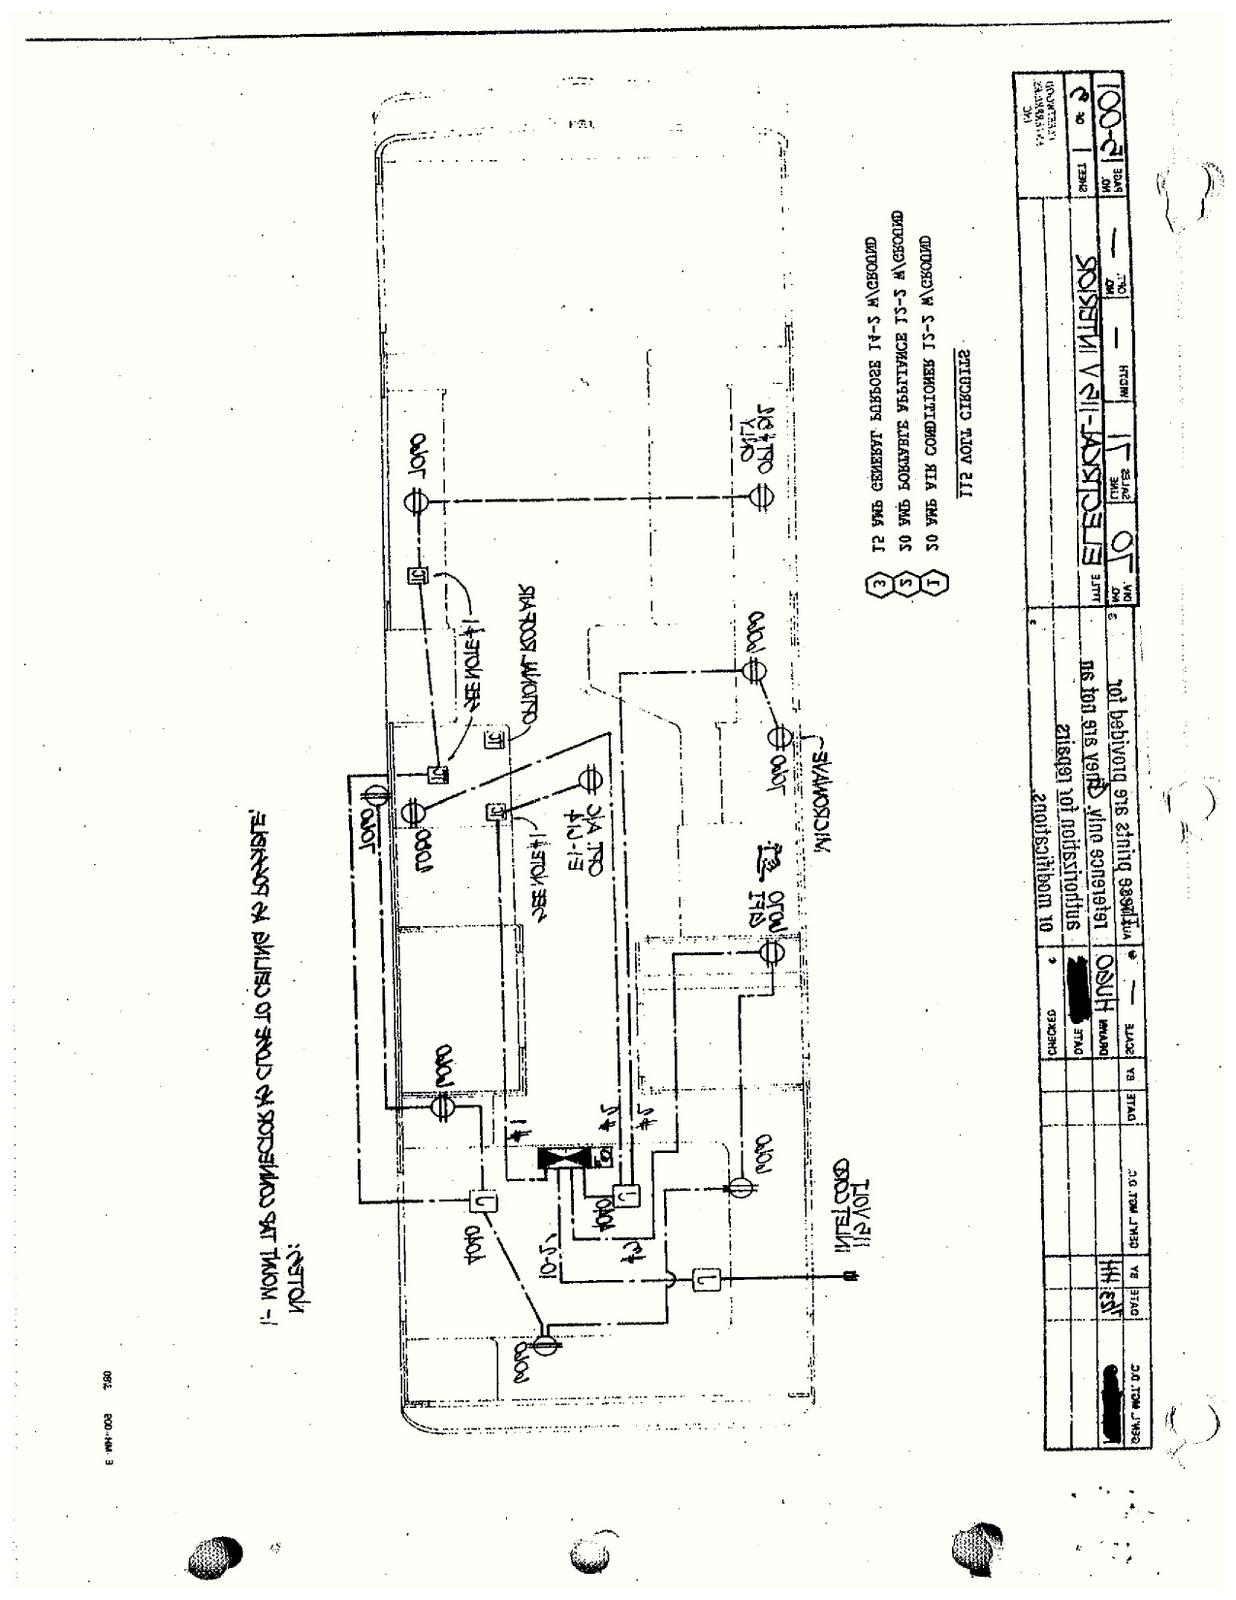 medium resolution of must be the place i reckon nyuk nyuk nyuk curly auto parts diagrams wiring diagrams second